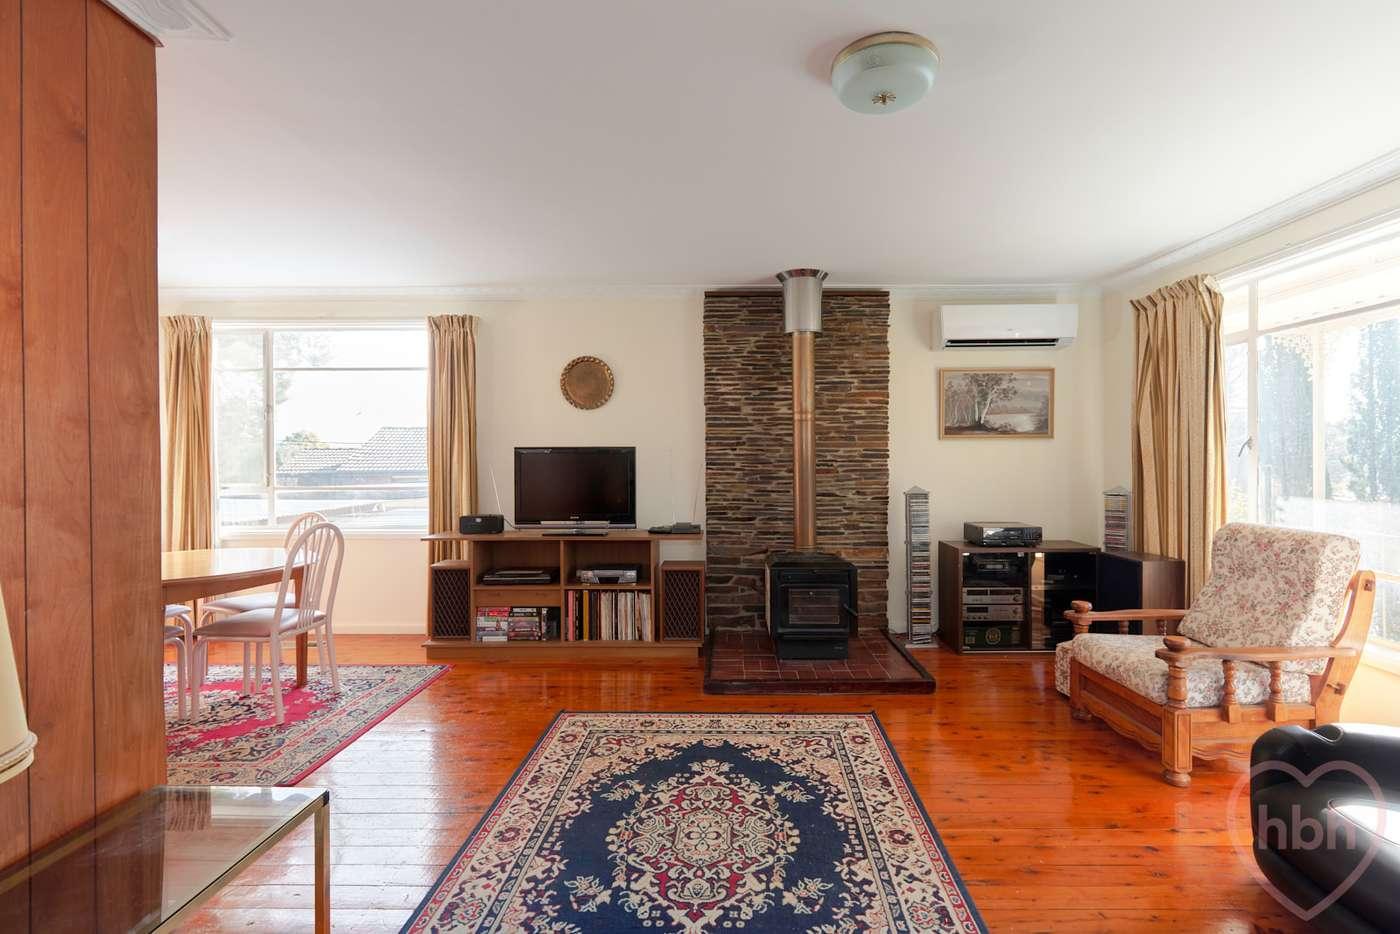 Main view of Homely house listing, 44 Rivett Street, Hackett ACT 2602